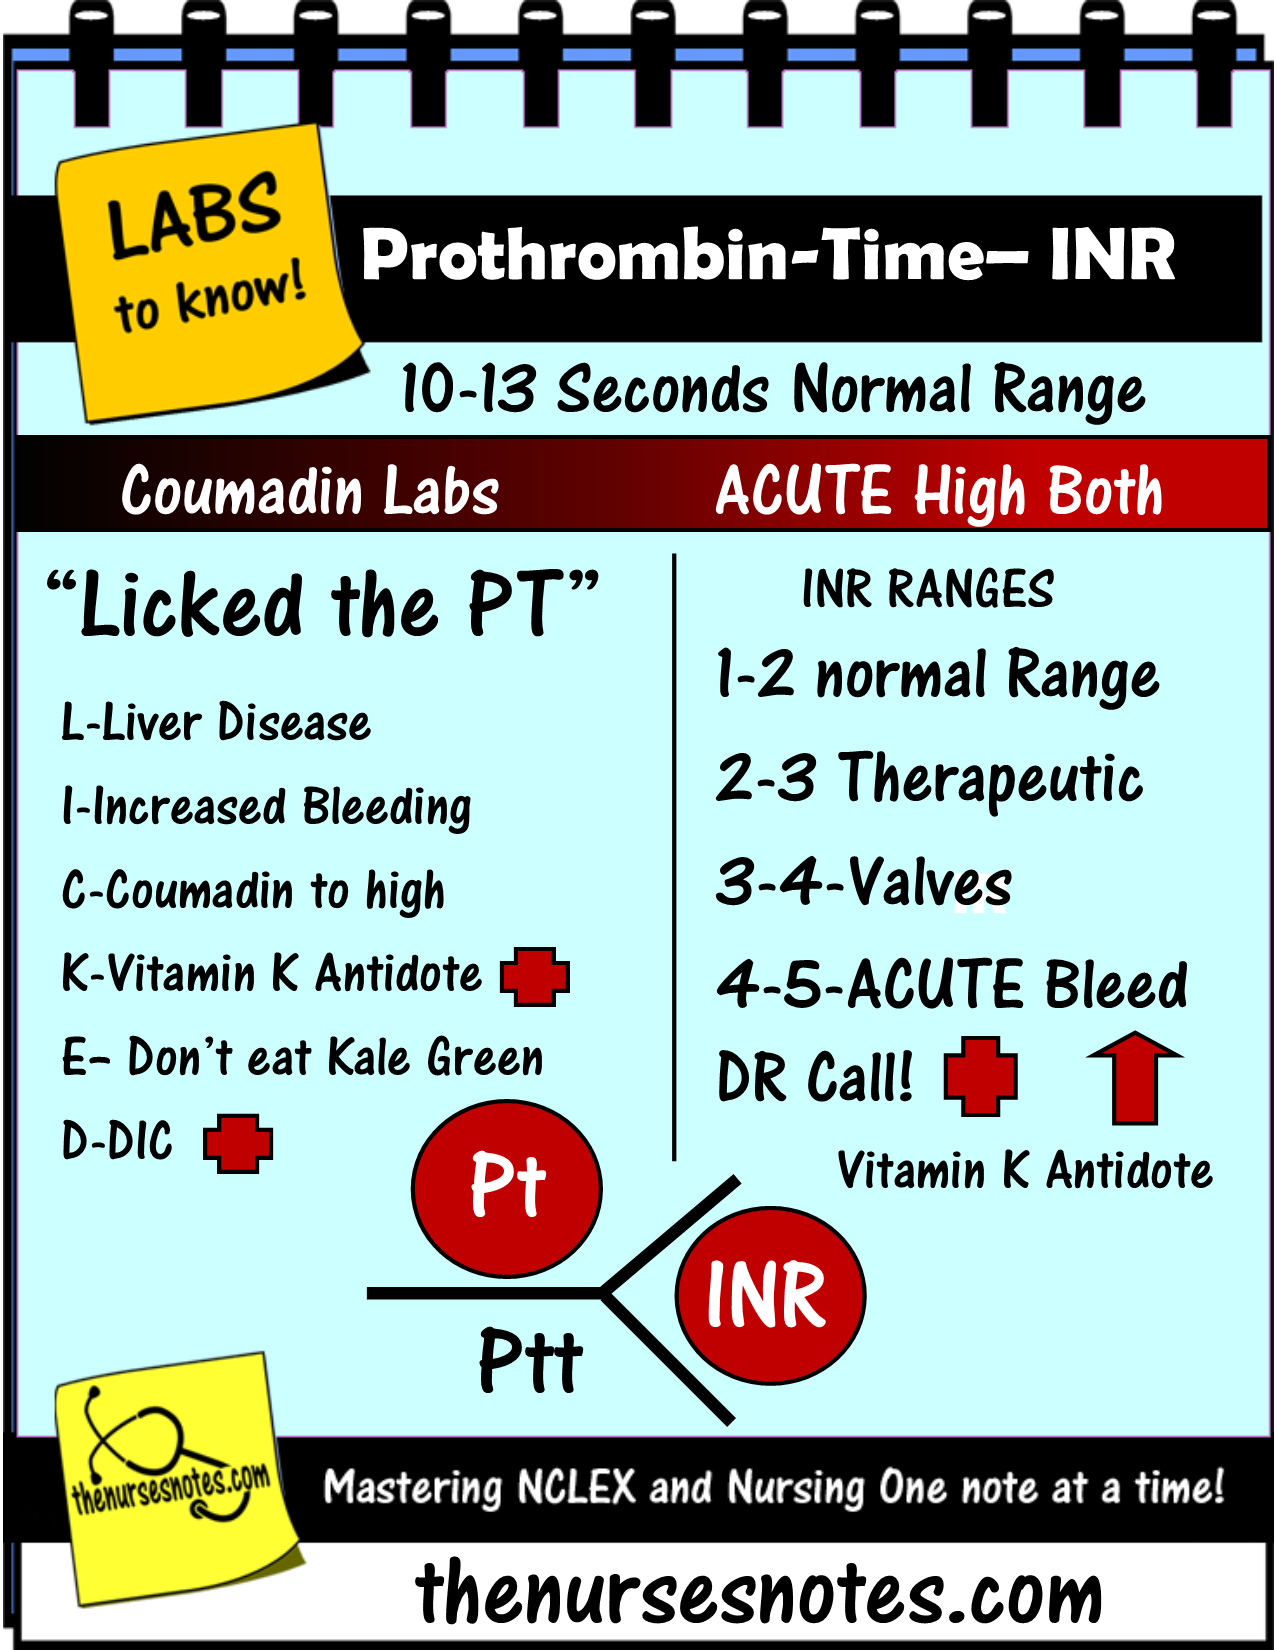 Coagulation labs prothrombin inr cardiac enzymes fishbone cheat coagulation labs prothrombin inr cardiac enzymes fishbone cheat sheet mnemonic ccuart Choice Image